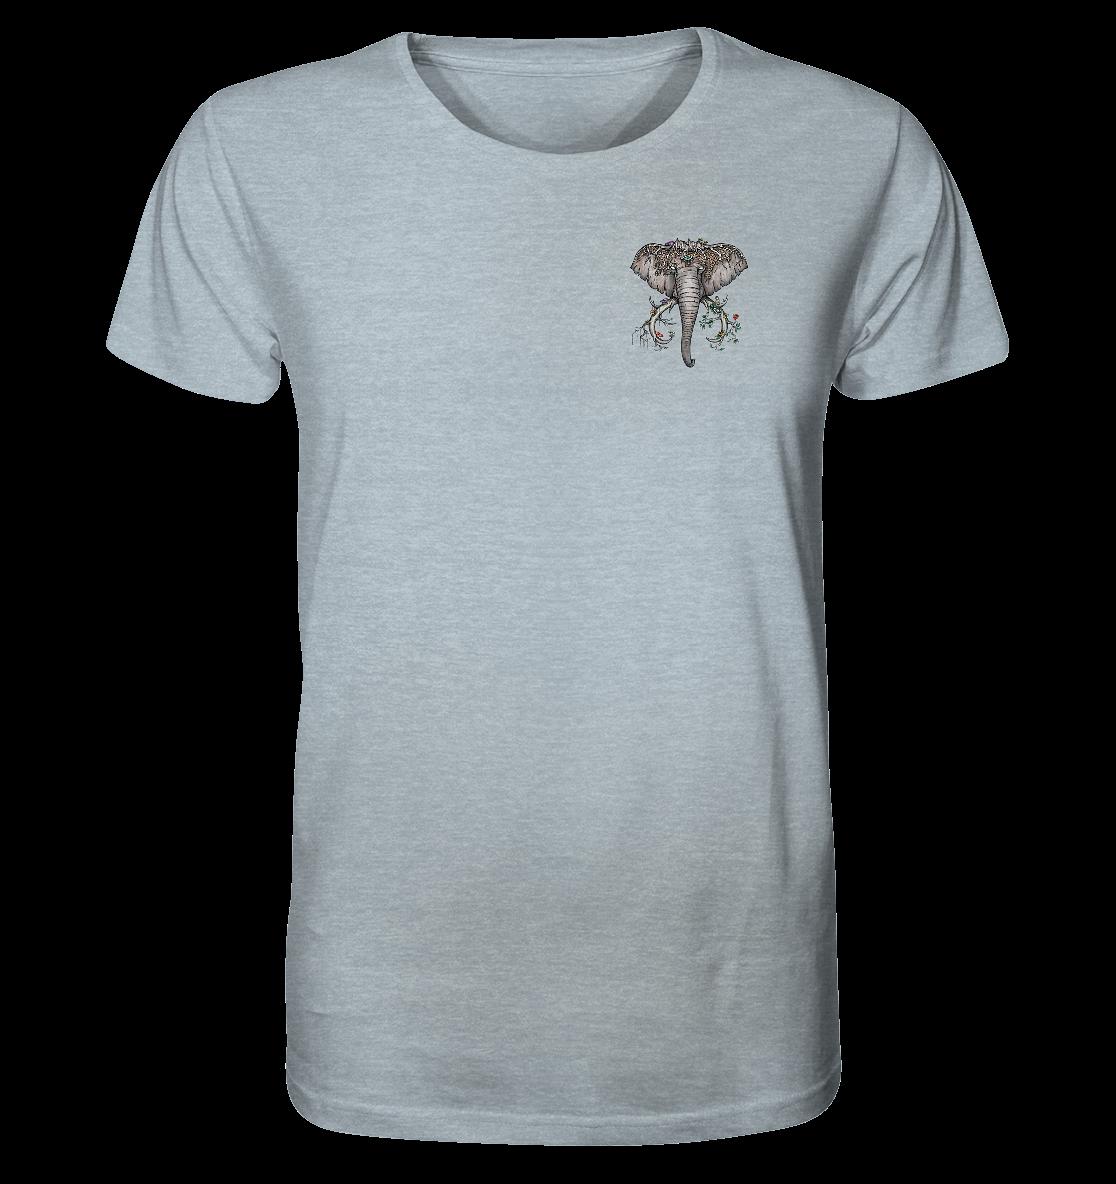 front-organic-shirt-meliert-adbfcb-1116x-3.png